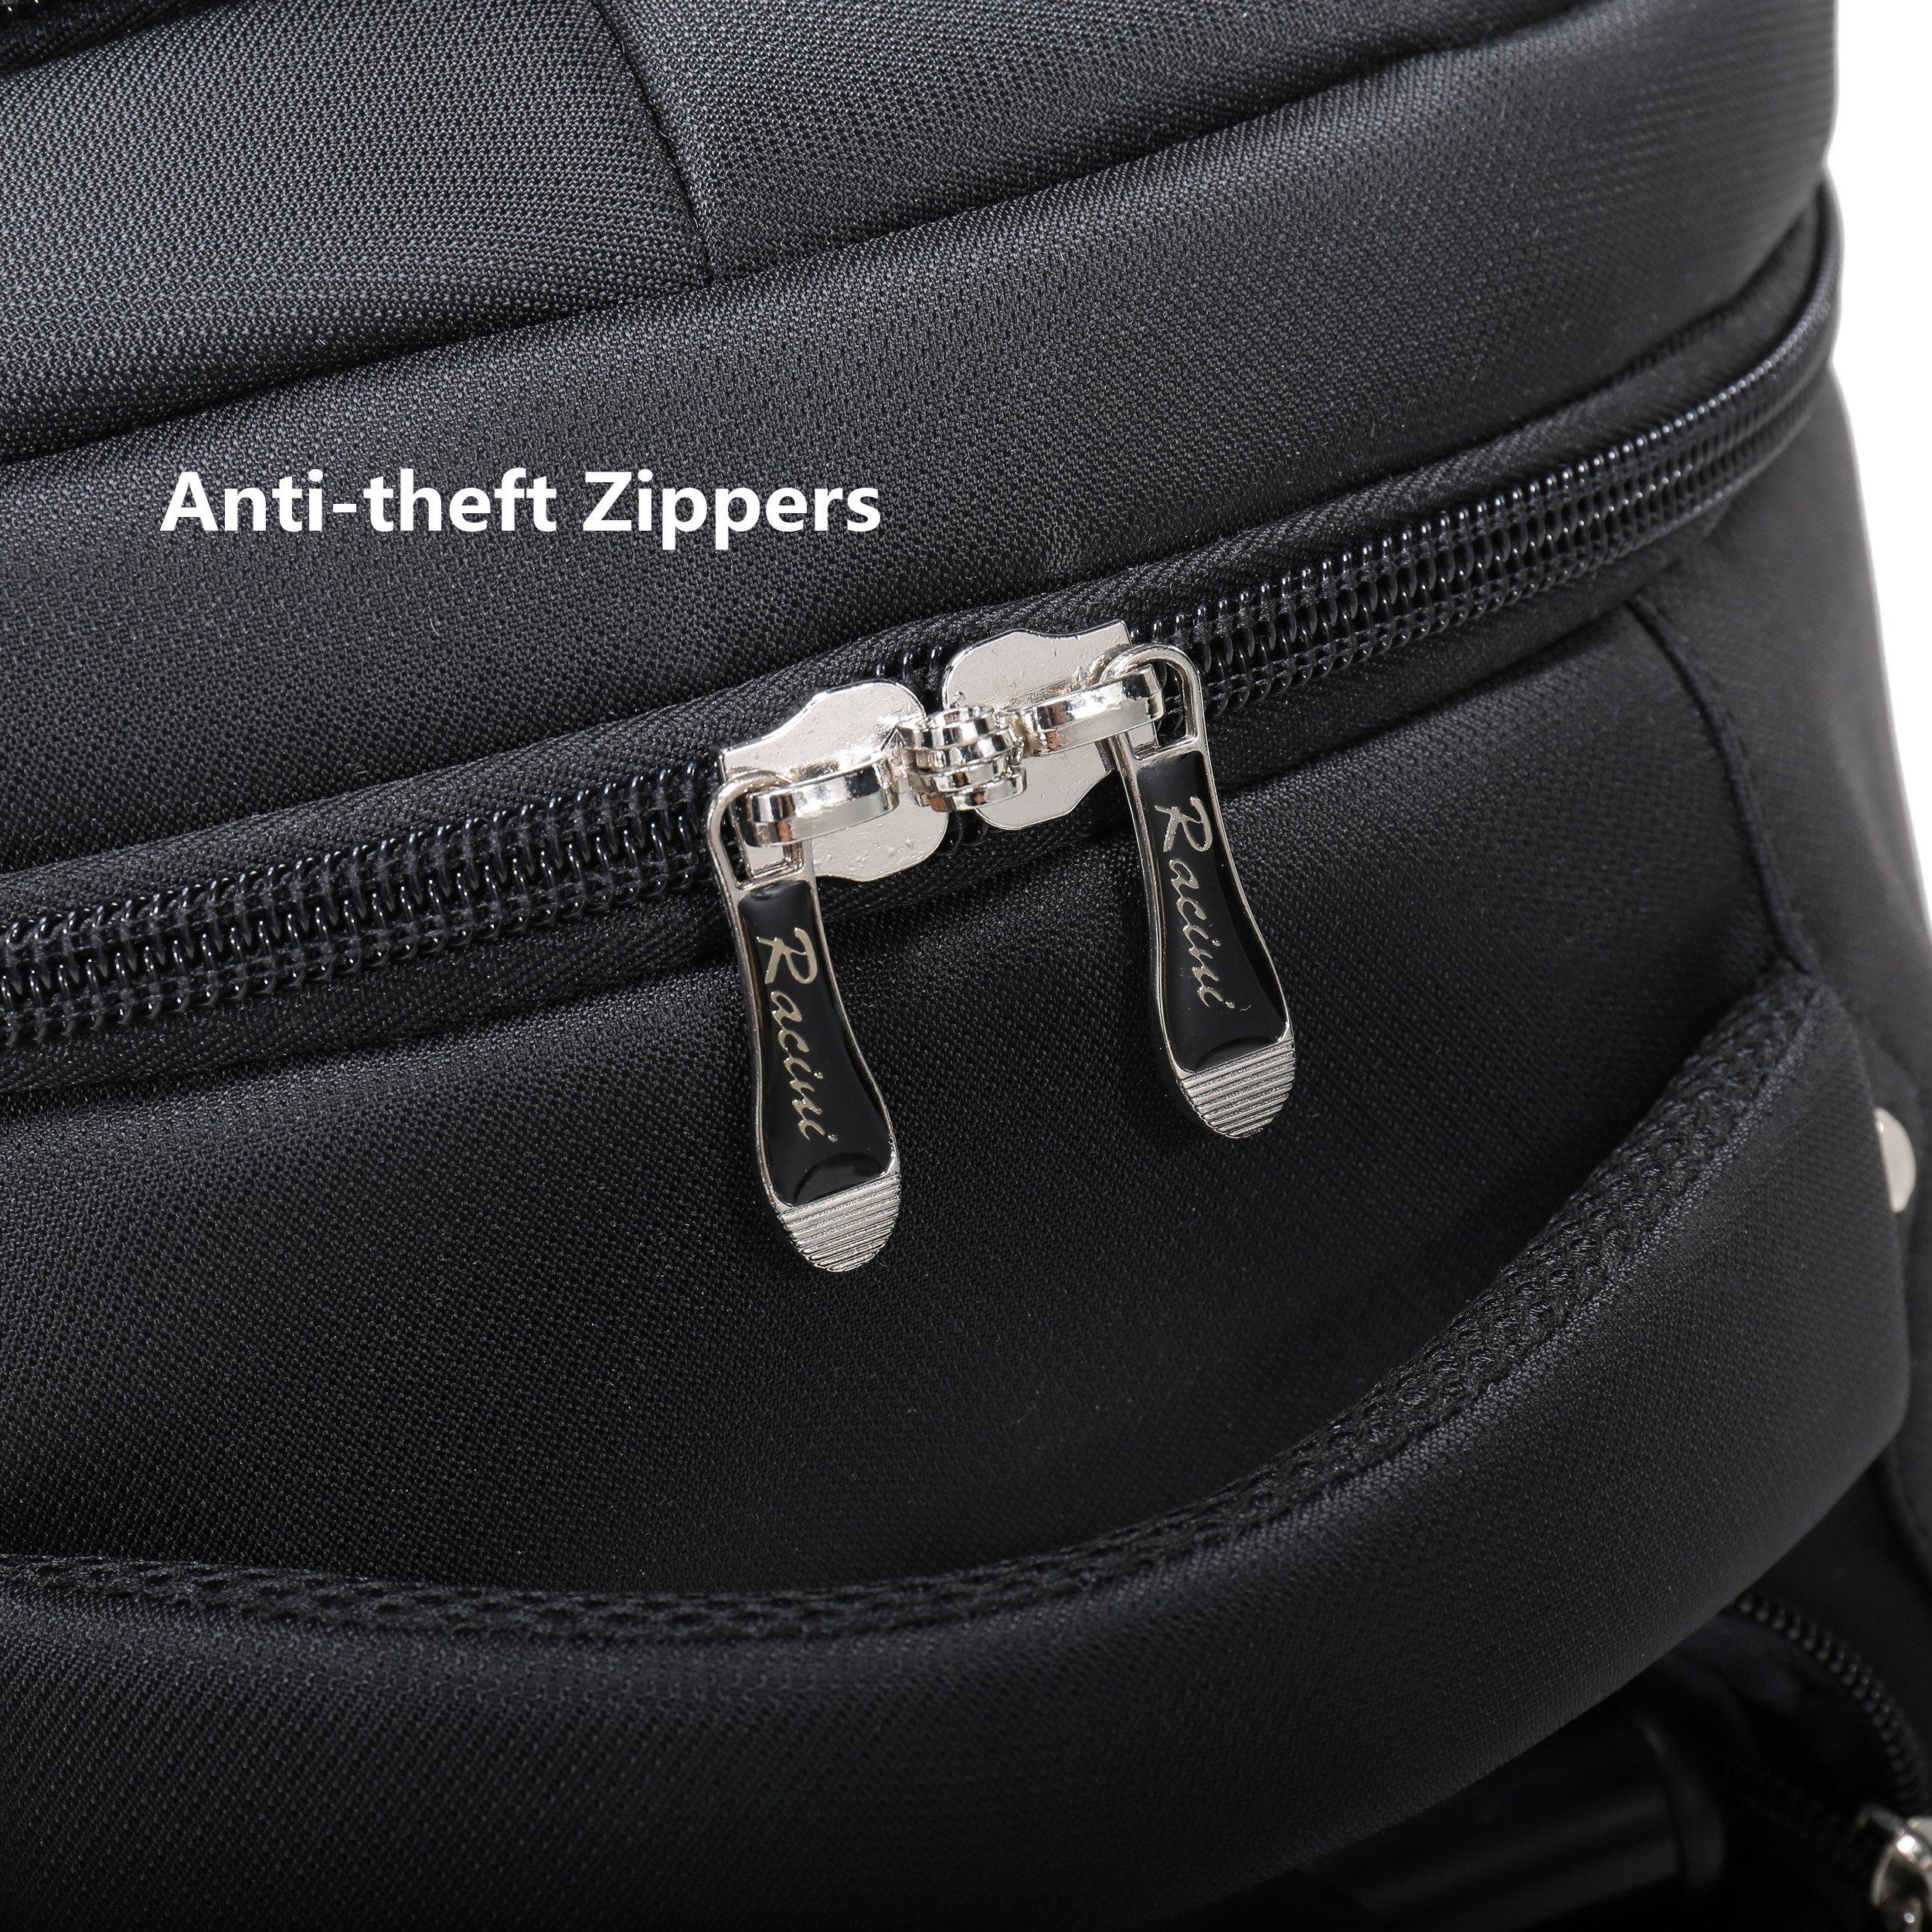 Racini Nylon Waterproof Rolling Backpack, Freewheel Travel School Wheeled Backpack, Carry-on Luggage with Anti-theft Zippers (Black) by Racini (Image #8)